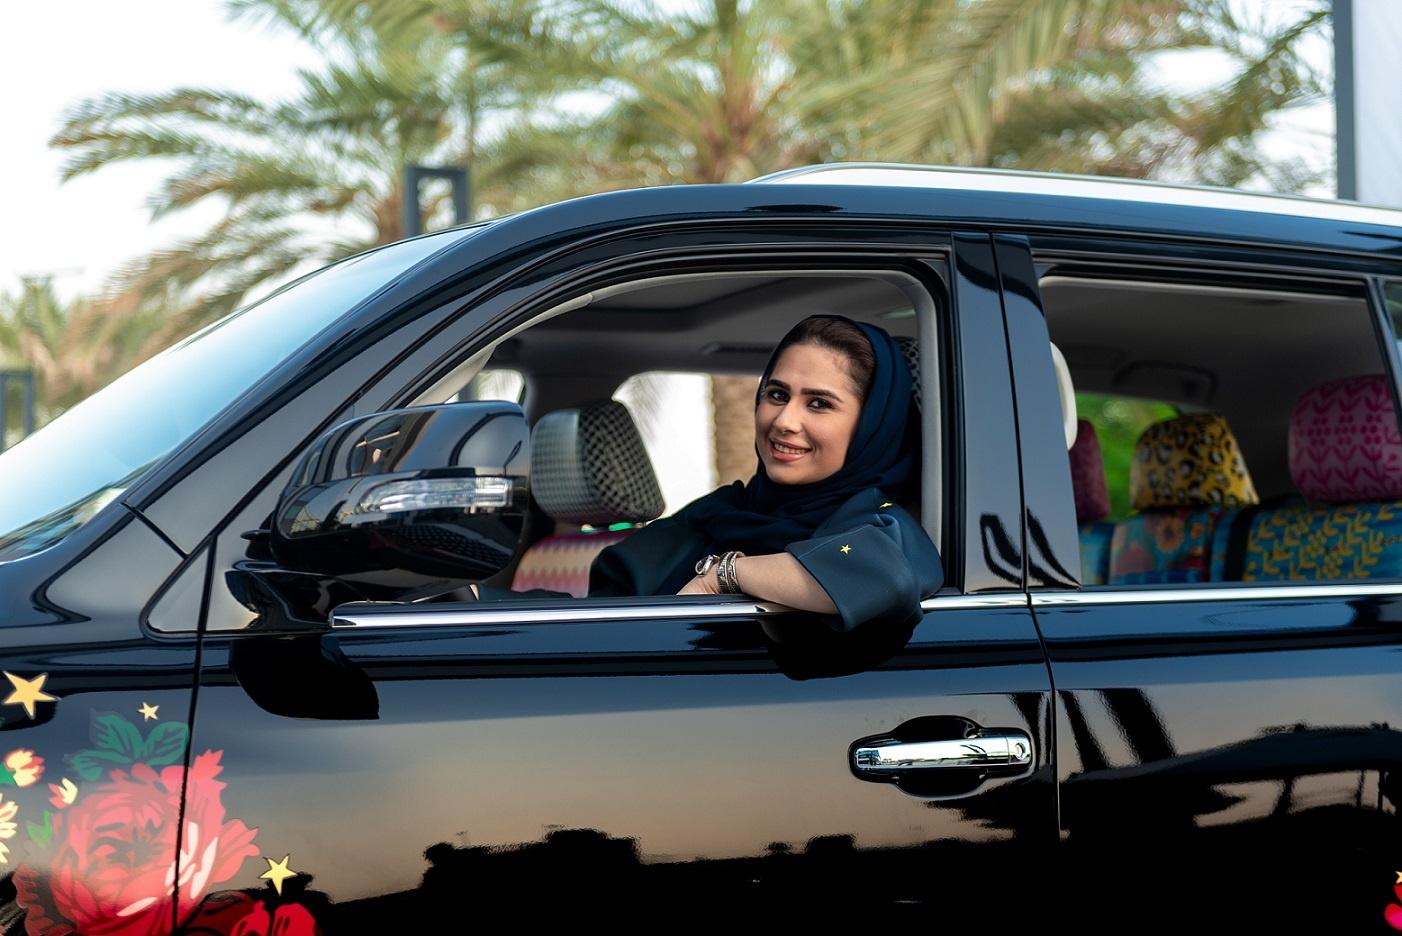 Al-Futtaim Toyota and Emirati Designer Fatma AlMulla Celebrate UAE Culture with Special Edition 2021 Land Cruiser